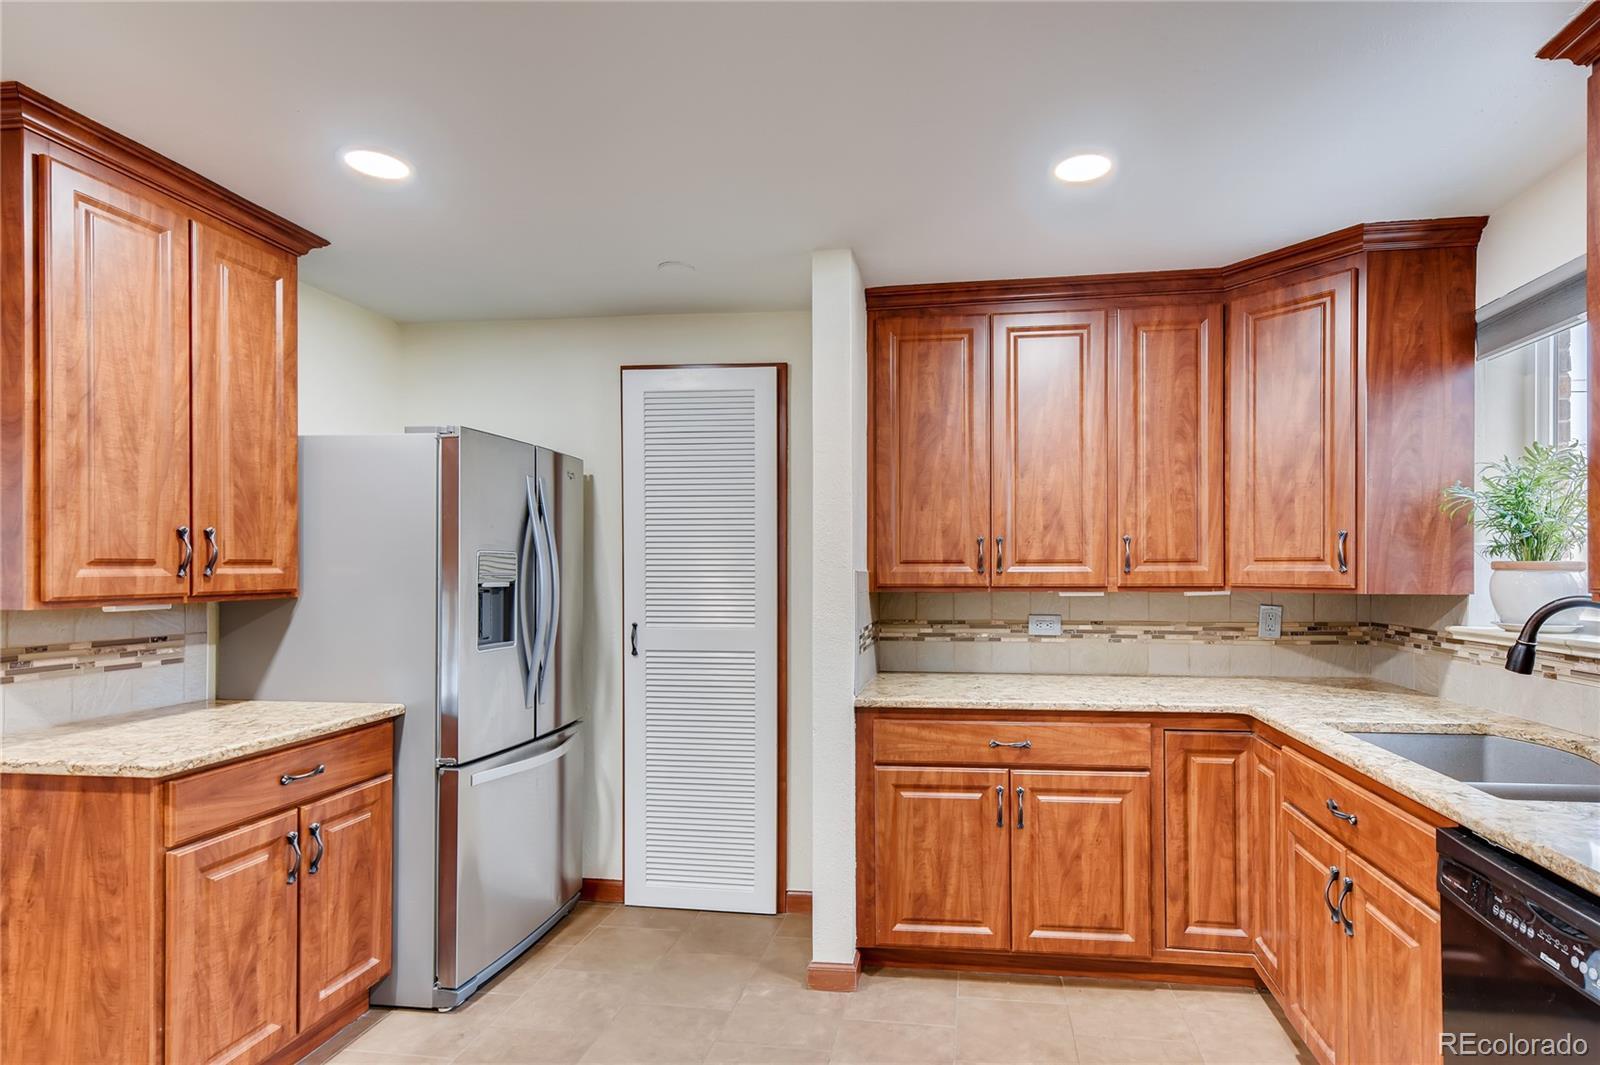 MLS# 5843899 - 8 - 1382 S Canosa Court, Denver, CO 80219